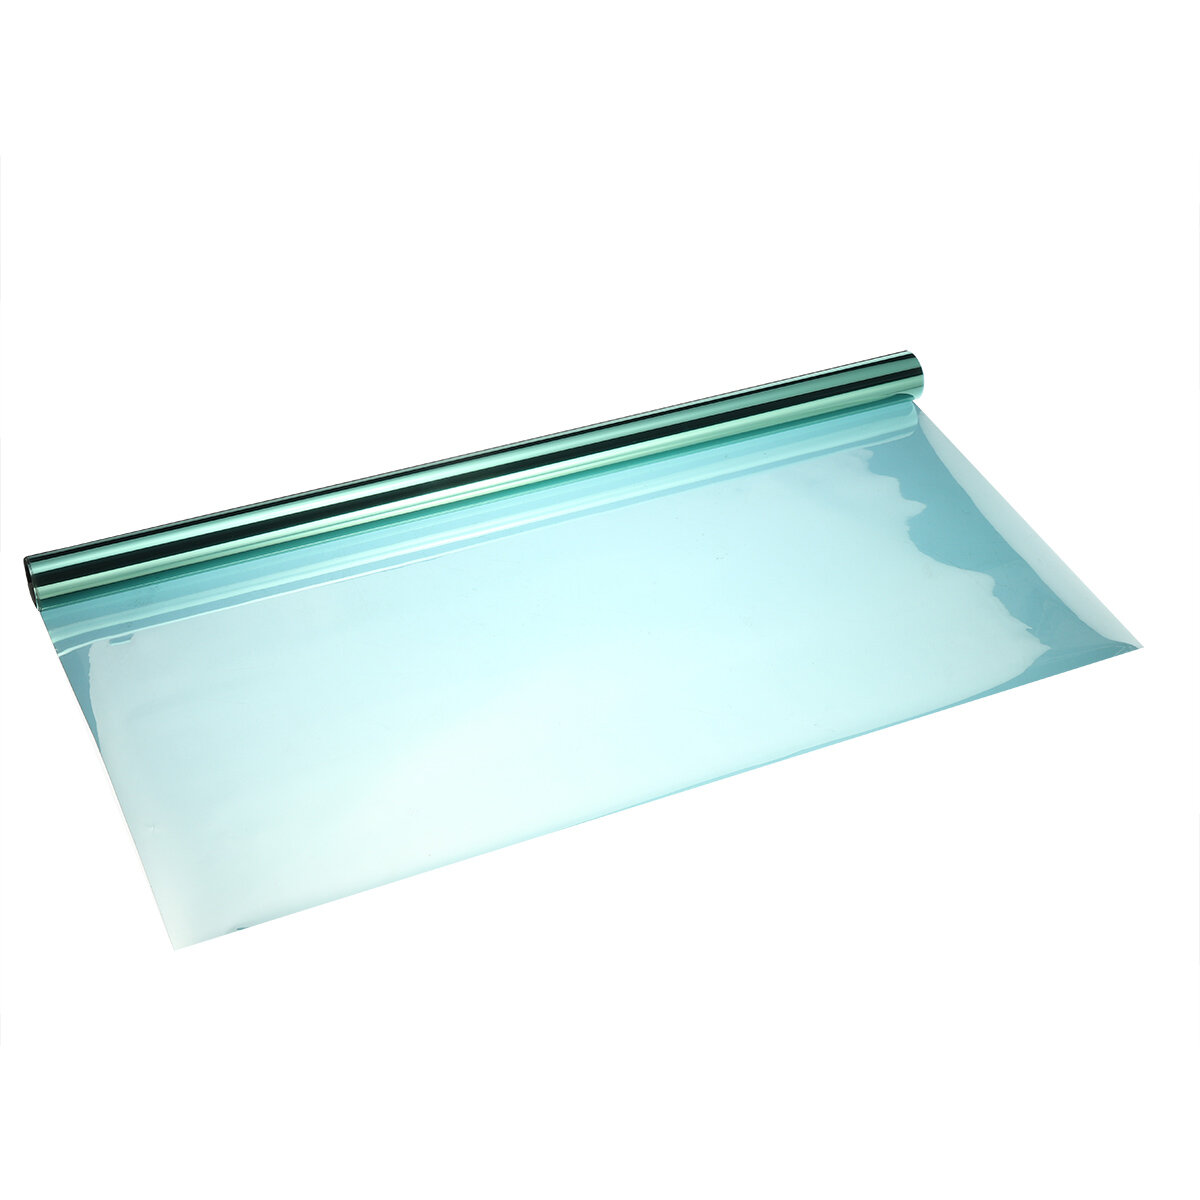 100x50cm Mirror Reflective One Way Privacy Window Film Sticky Back Glass Tint Sale Banggood Com